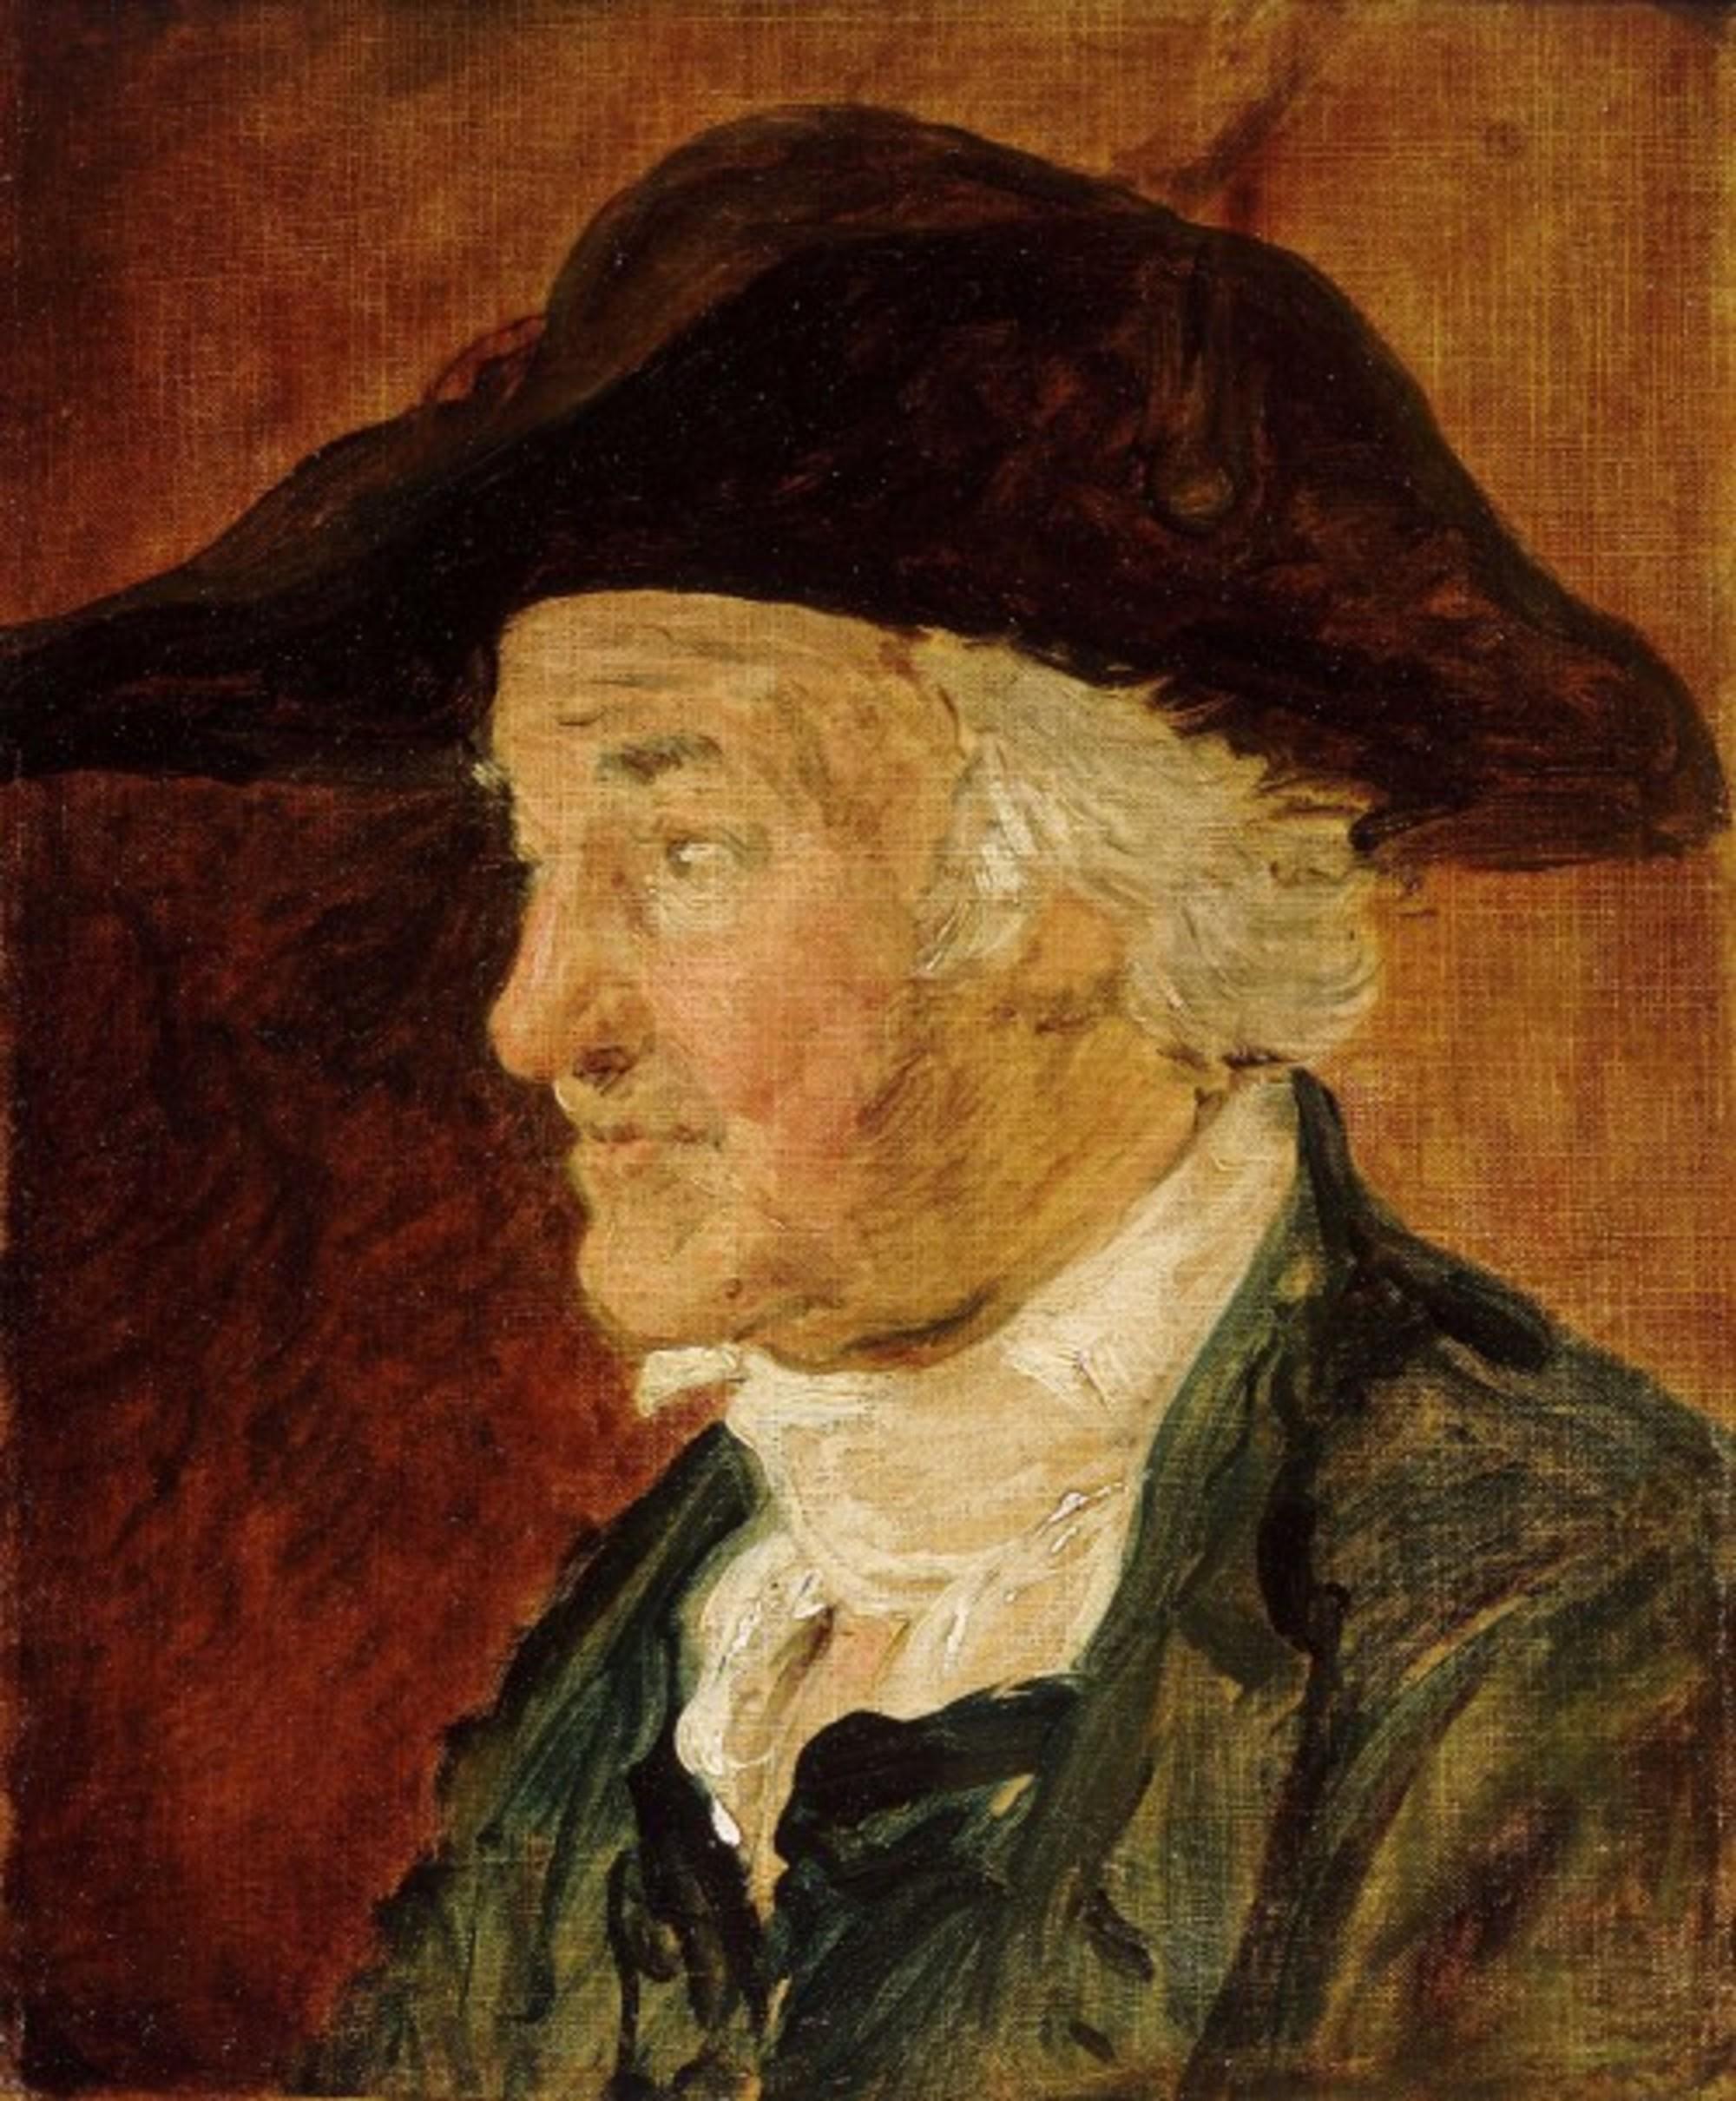 Commodore-Samuel-Wilkes-a-Greenwich-Pensioner-circa-1832-RMG-BHC3092.jpg